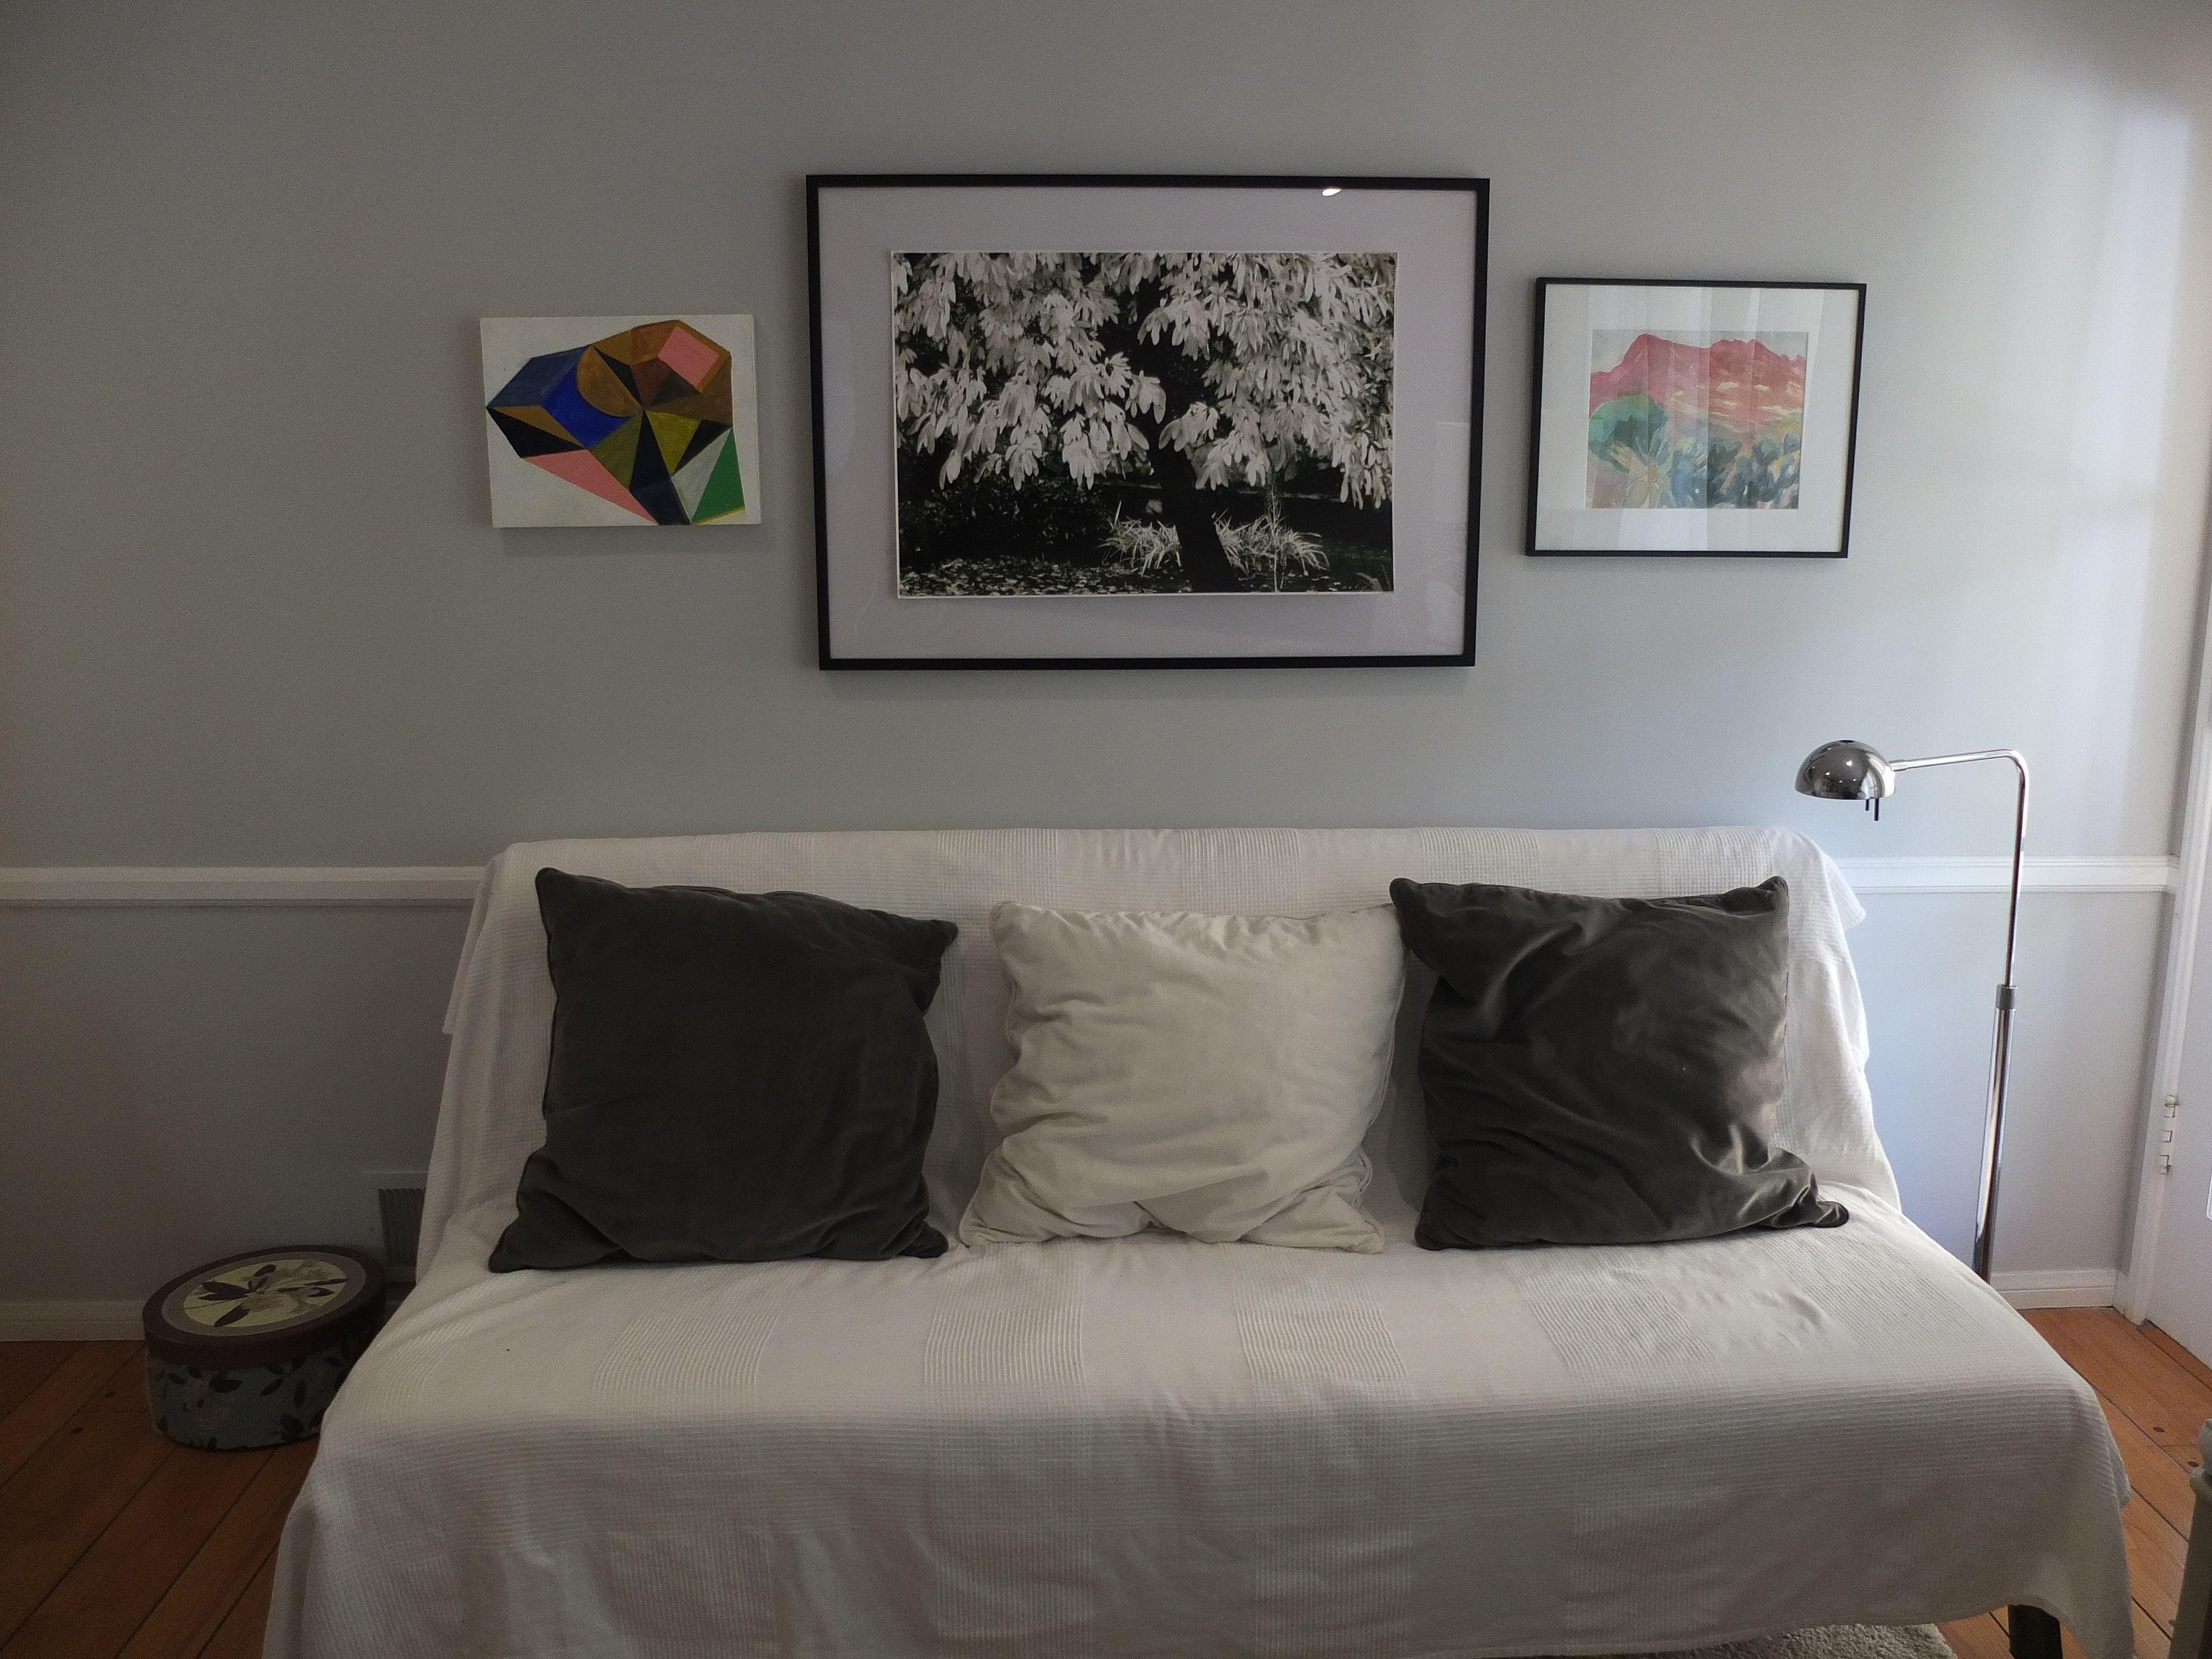 ribba frame ikea 20 x 30 print from costco